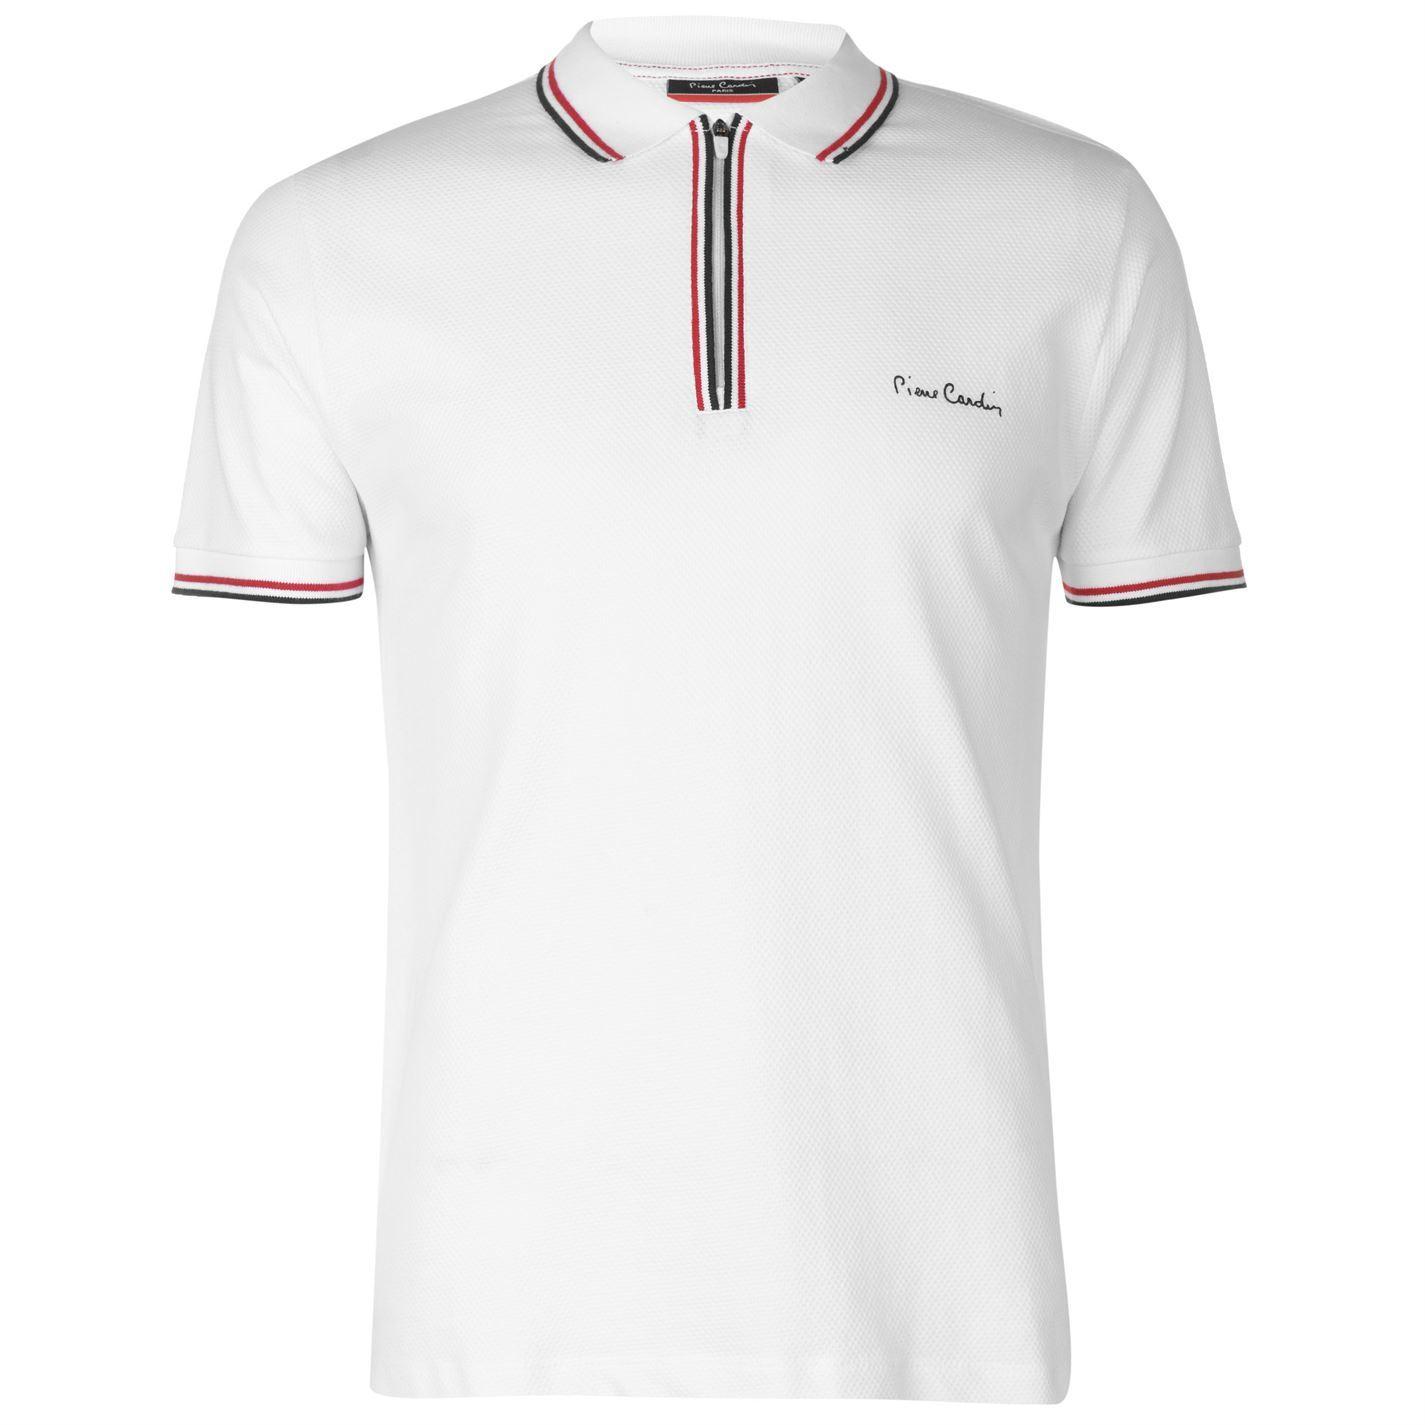 Pierre Cardin Mens Jacquard Zip Polo Shirt Classic Fit Tee Top Short